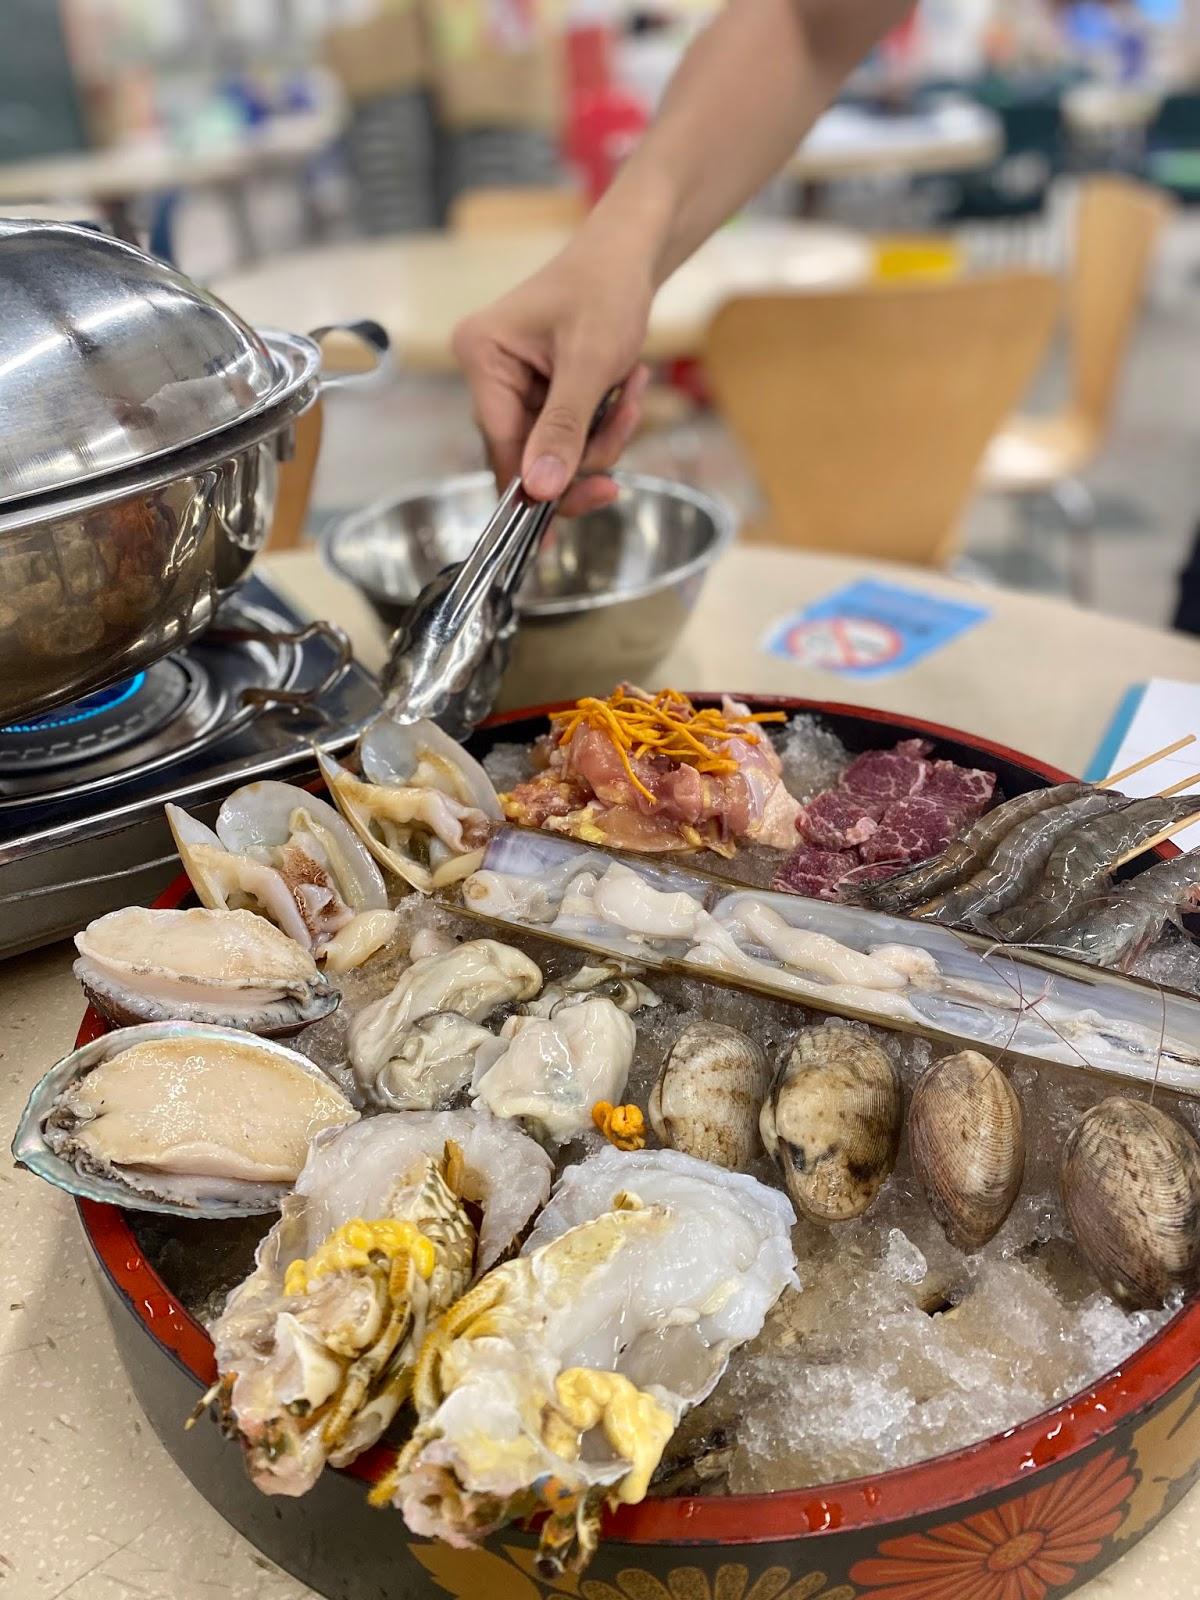 Lucas小食家《性價比極高新鮮海鮮蒸氣鍋》 - LogBook